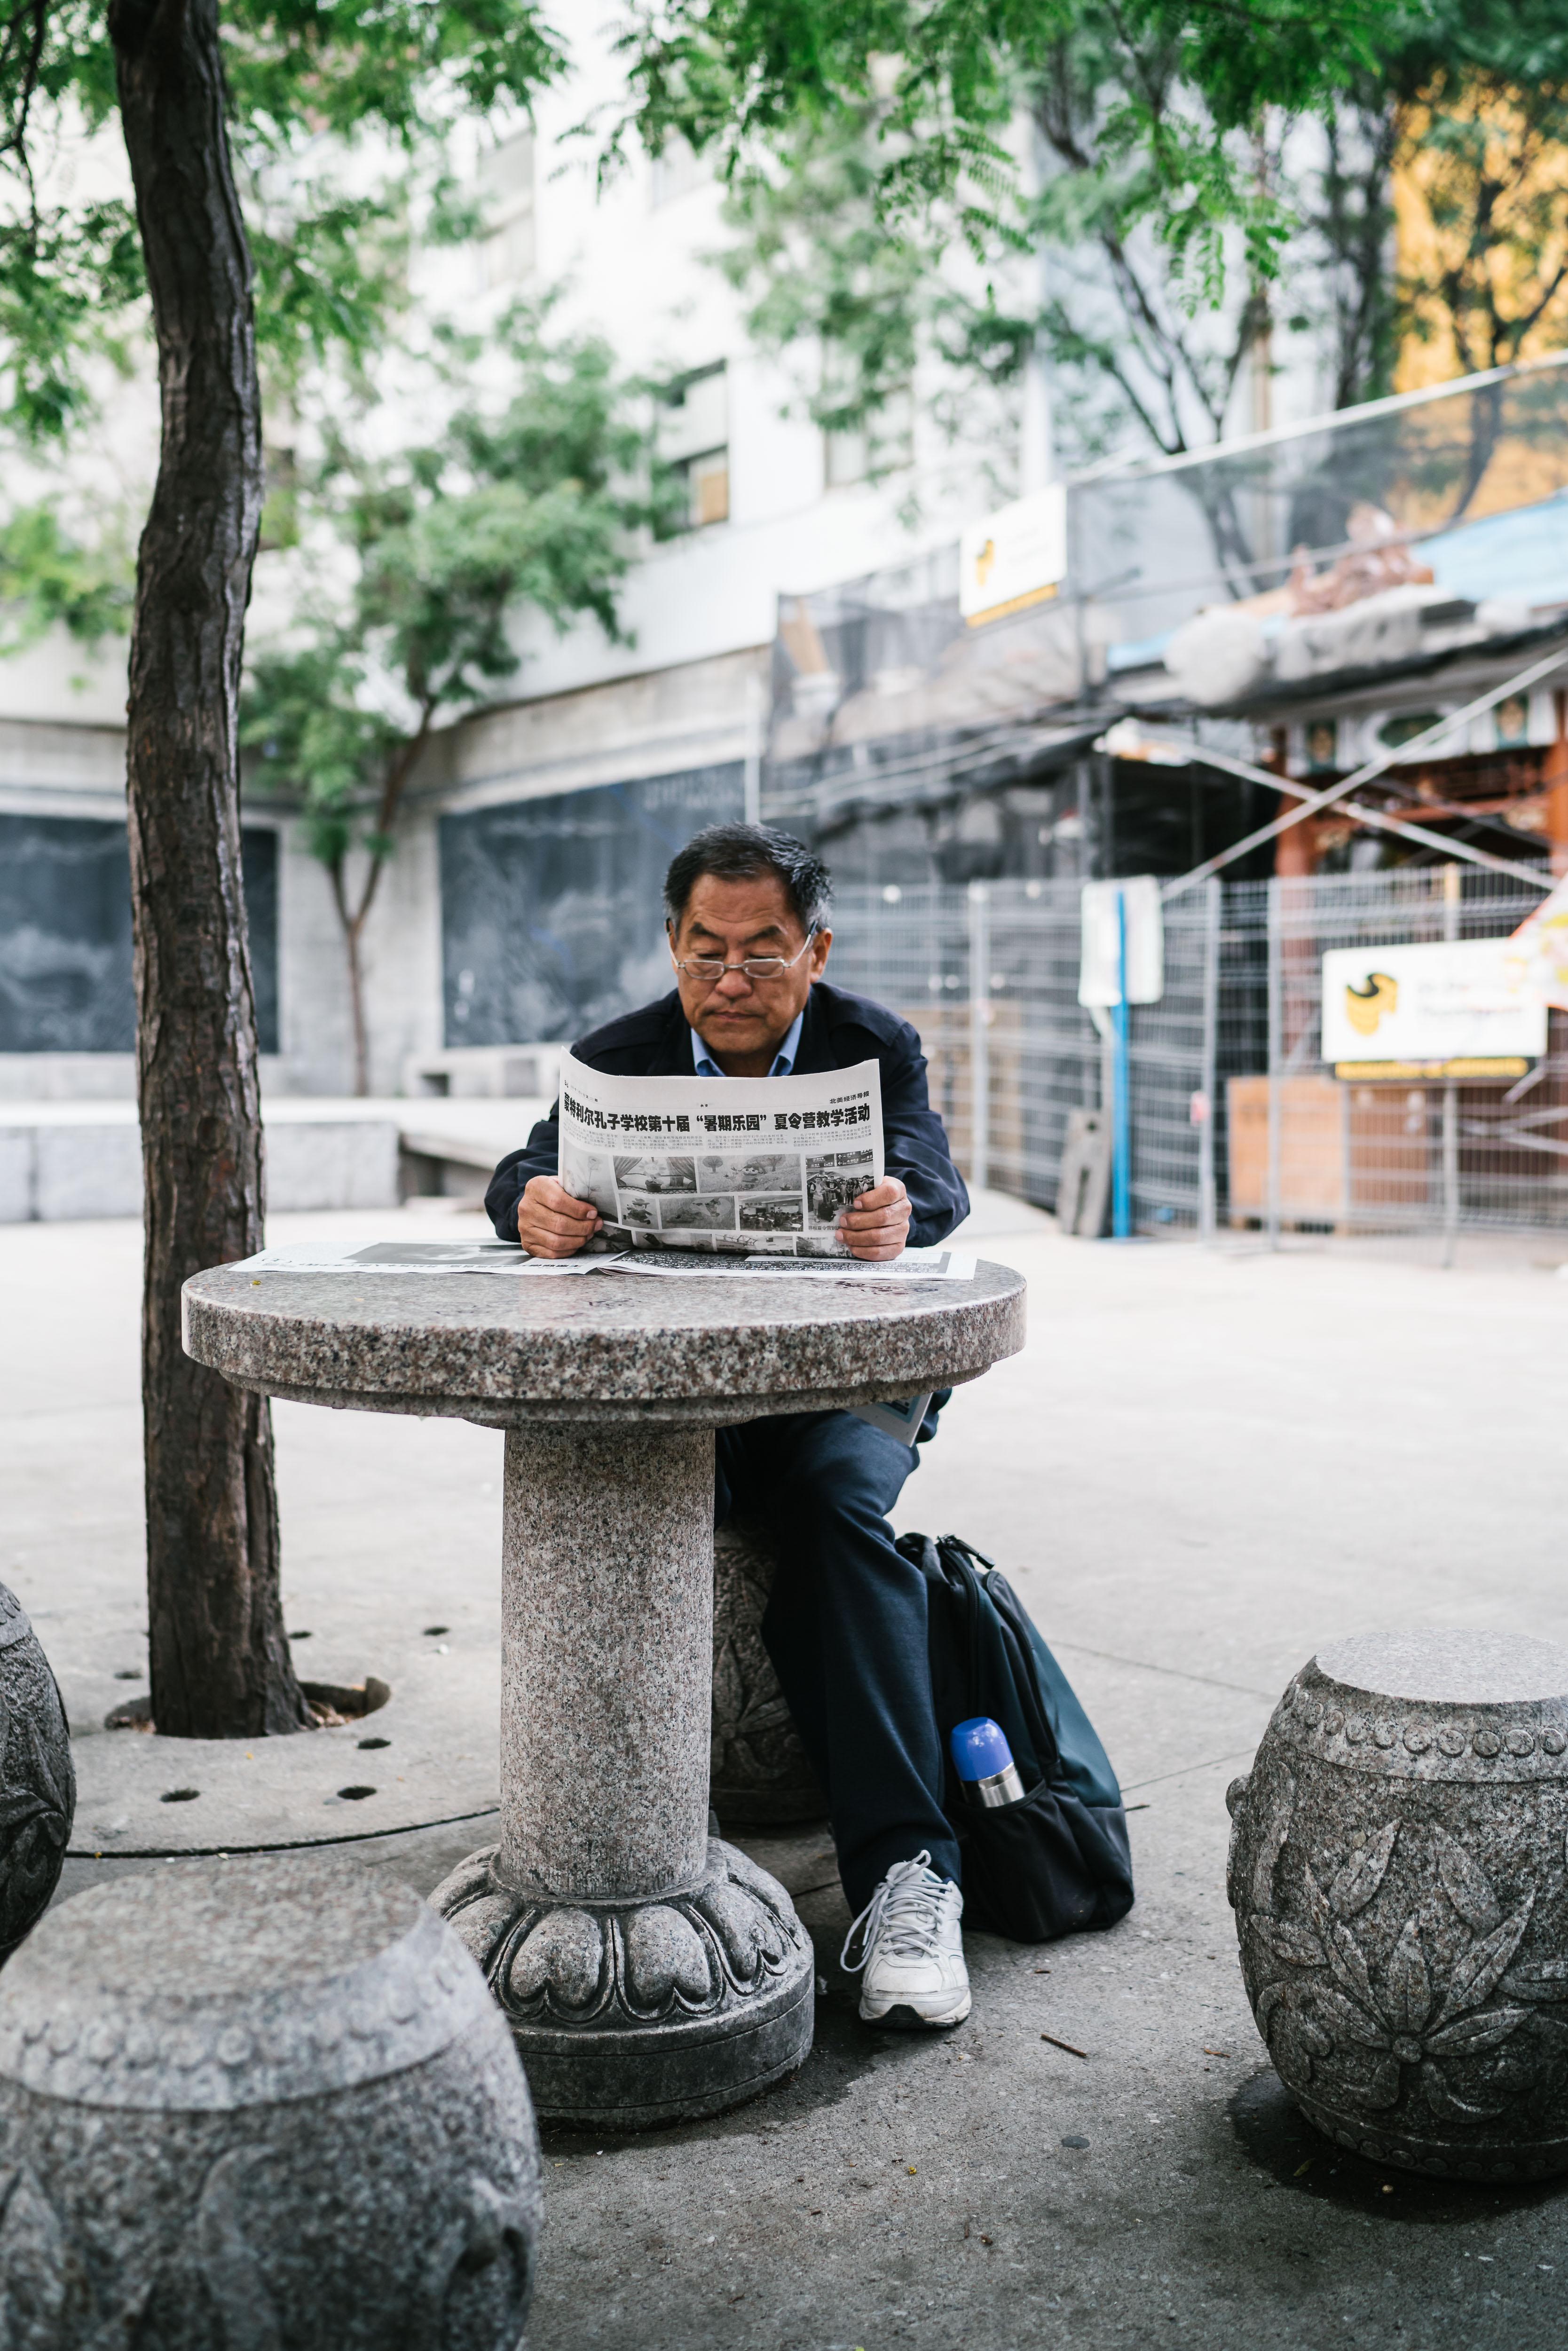 JC-READING MAN